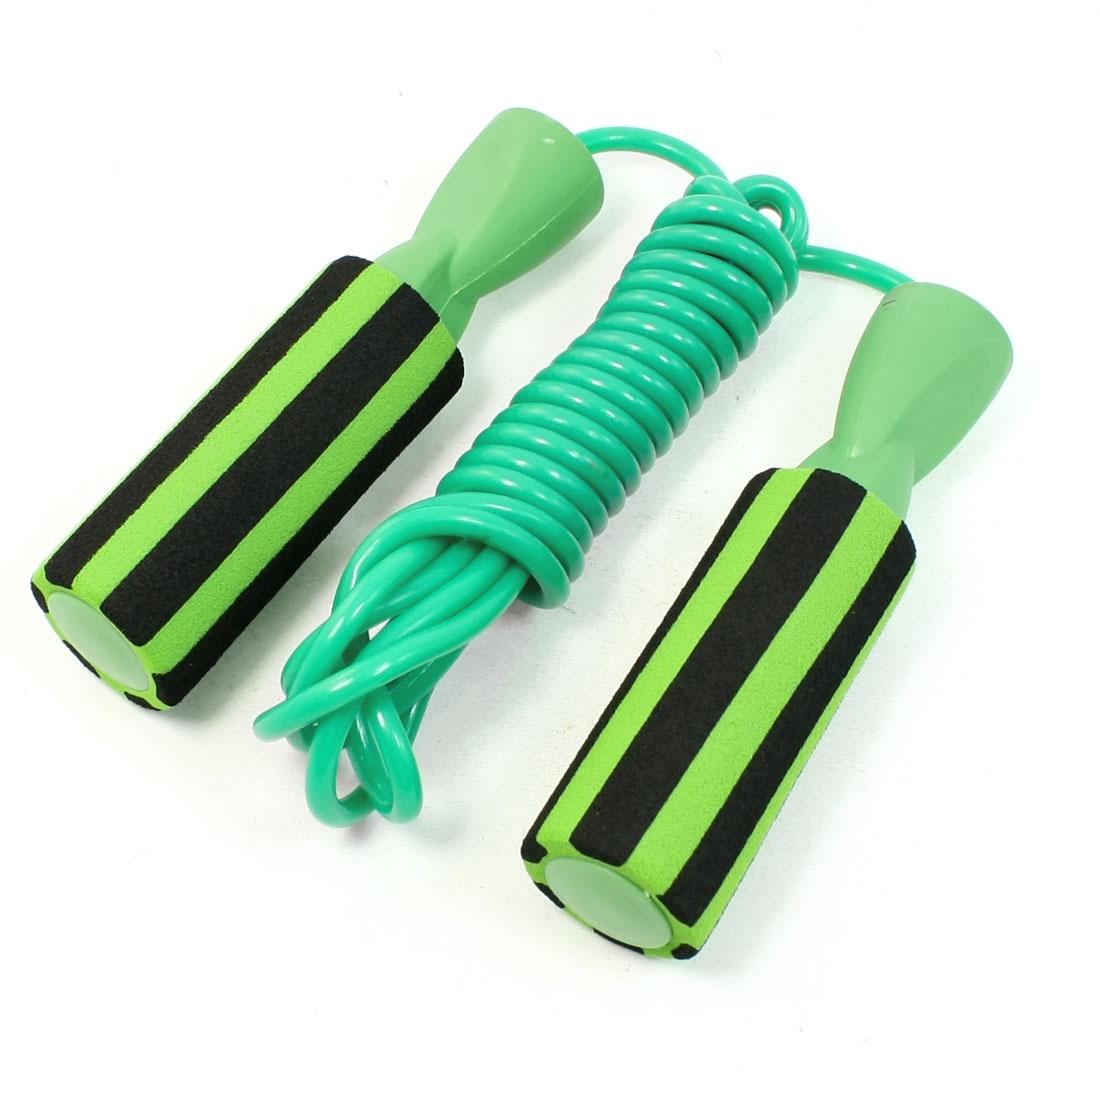 Sports Antislip Stripe Pattern Handle Flexible Jump Rope Green Black 9.2 Ft